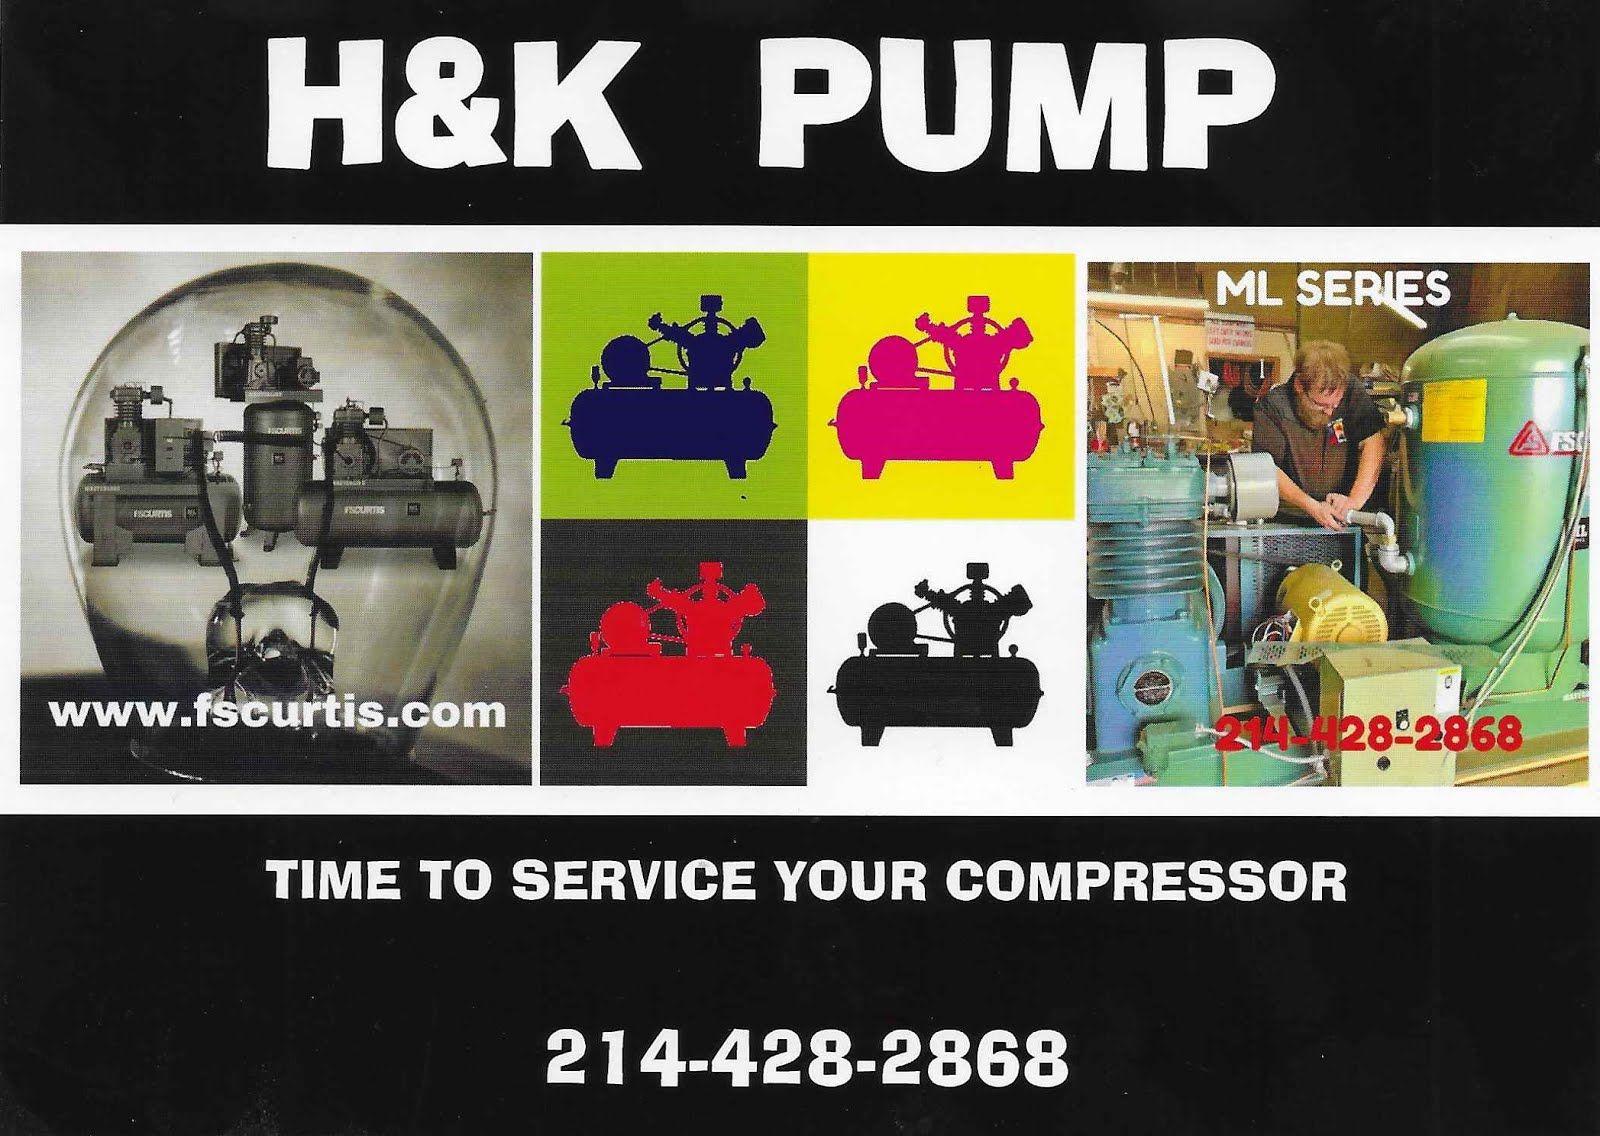 AIR COMPRESSOR SERVICE (With images) Air compressor